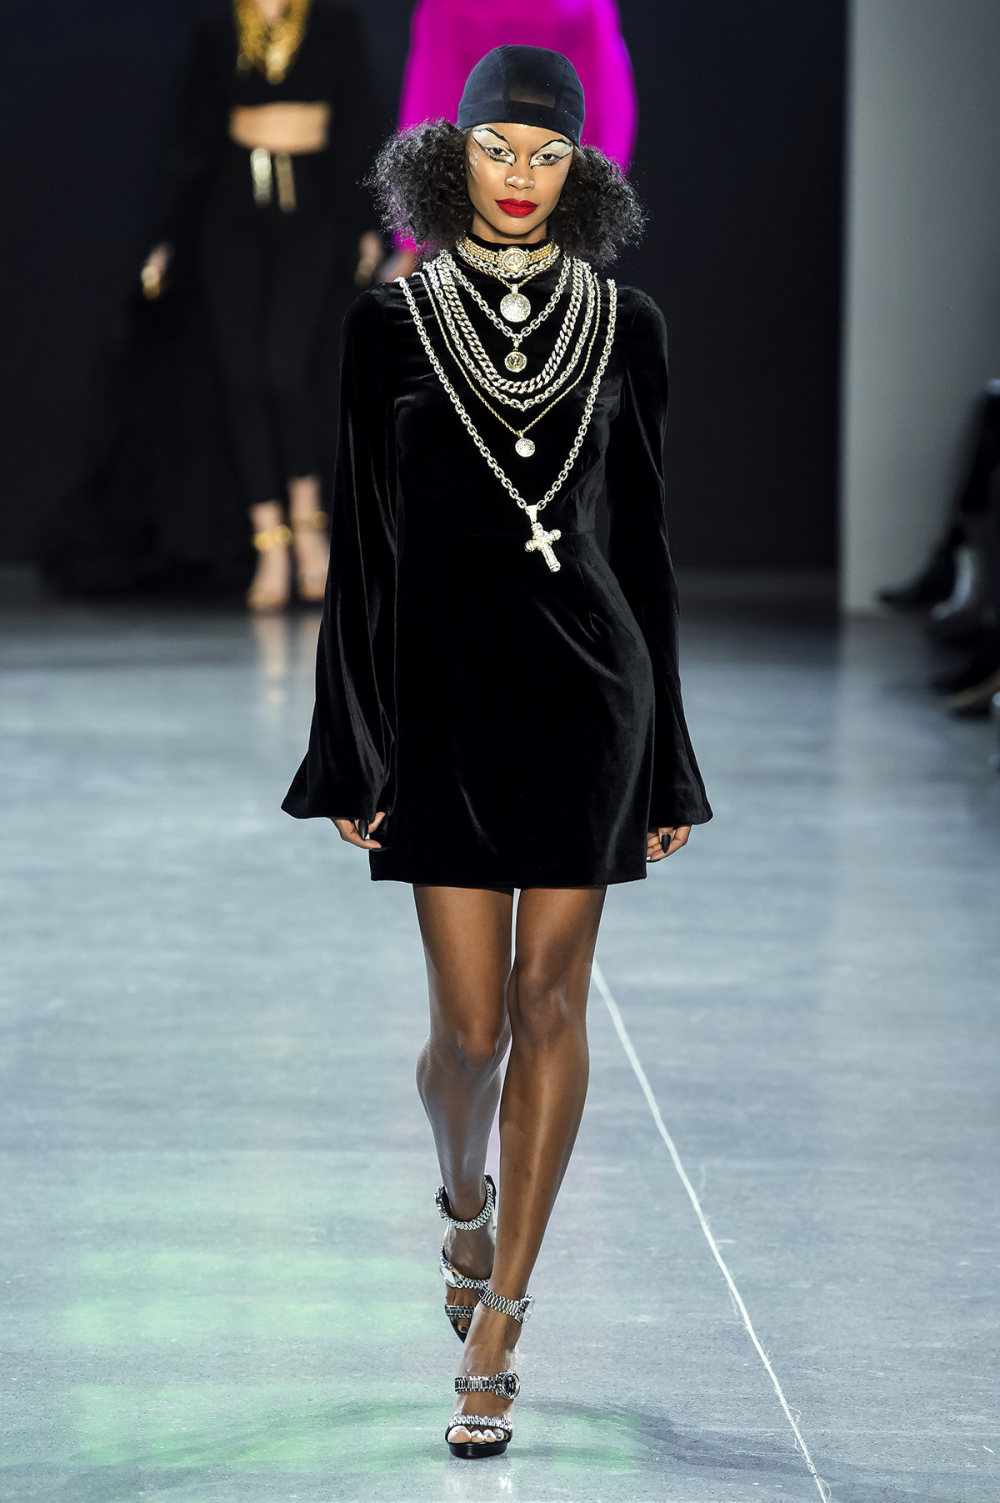 Christian Cowan时装系列虽然巨大的薄纱层状服装并没有那么特别-4.jpg